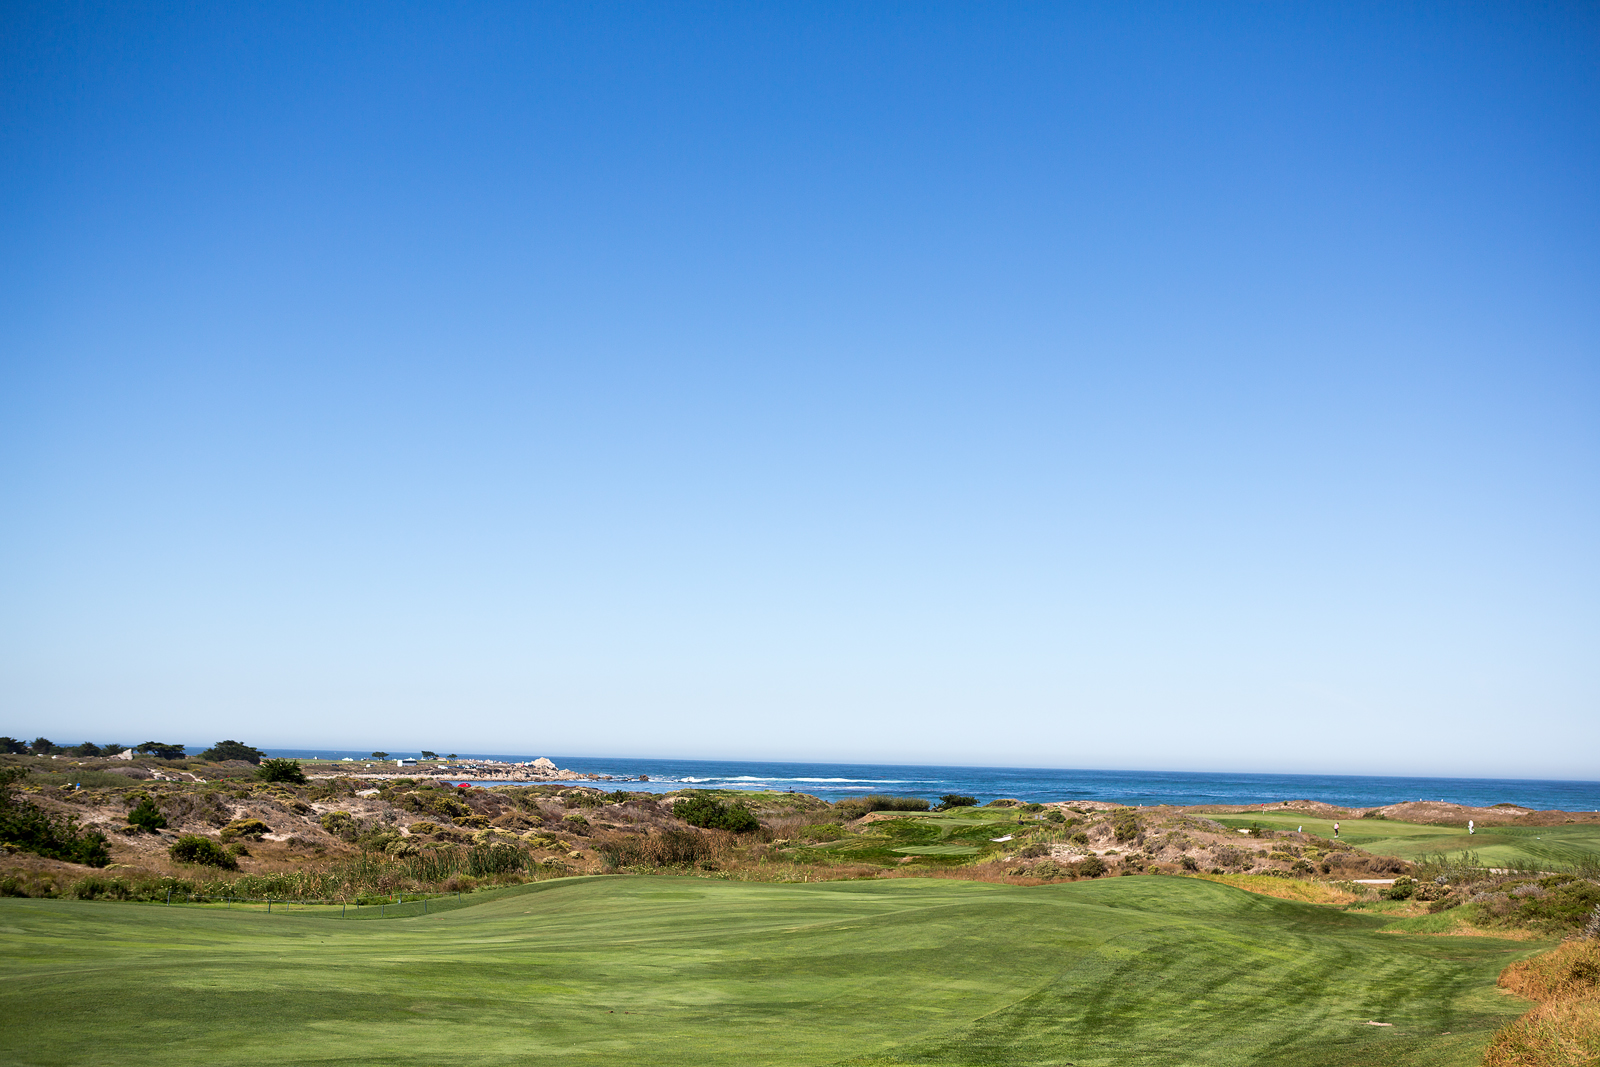 Panoramic Ocean Views at The Links at Spanish Bay